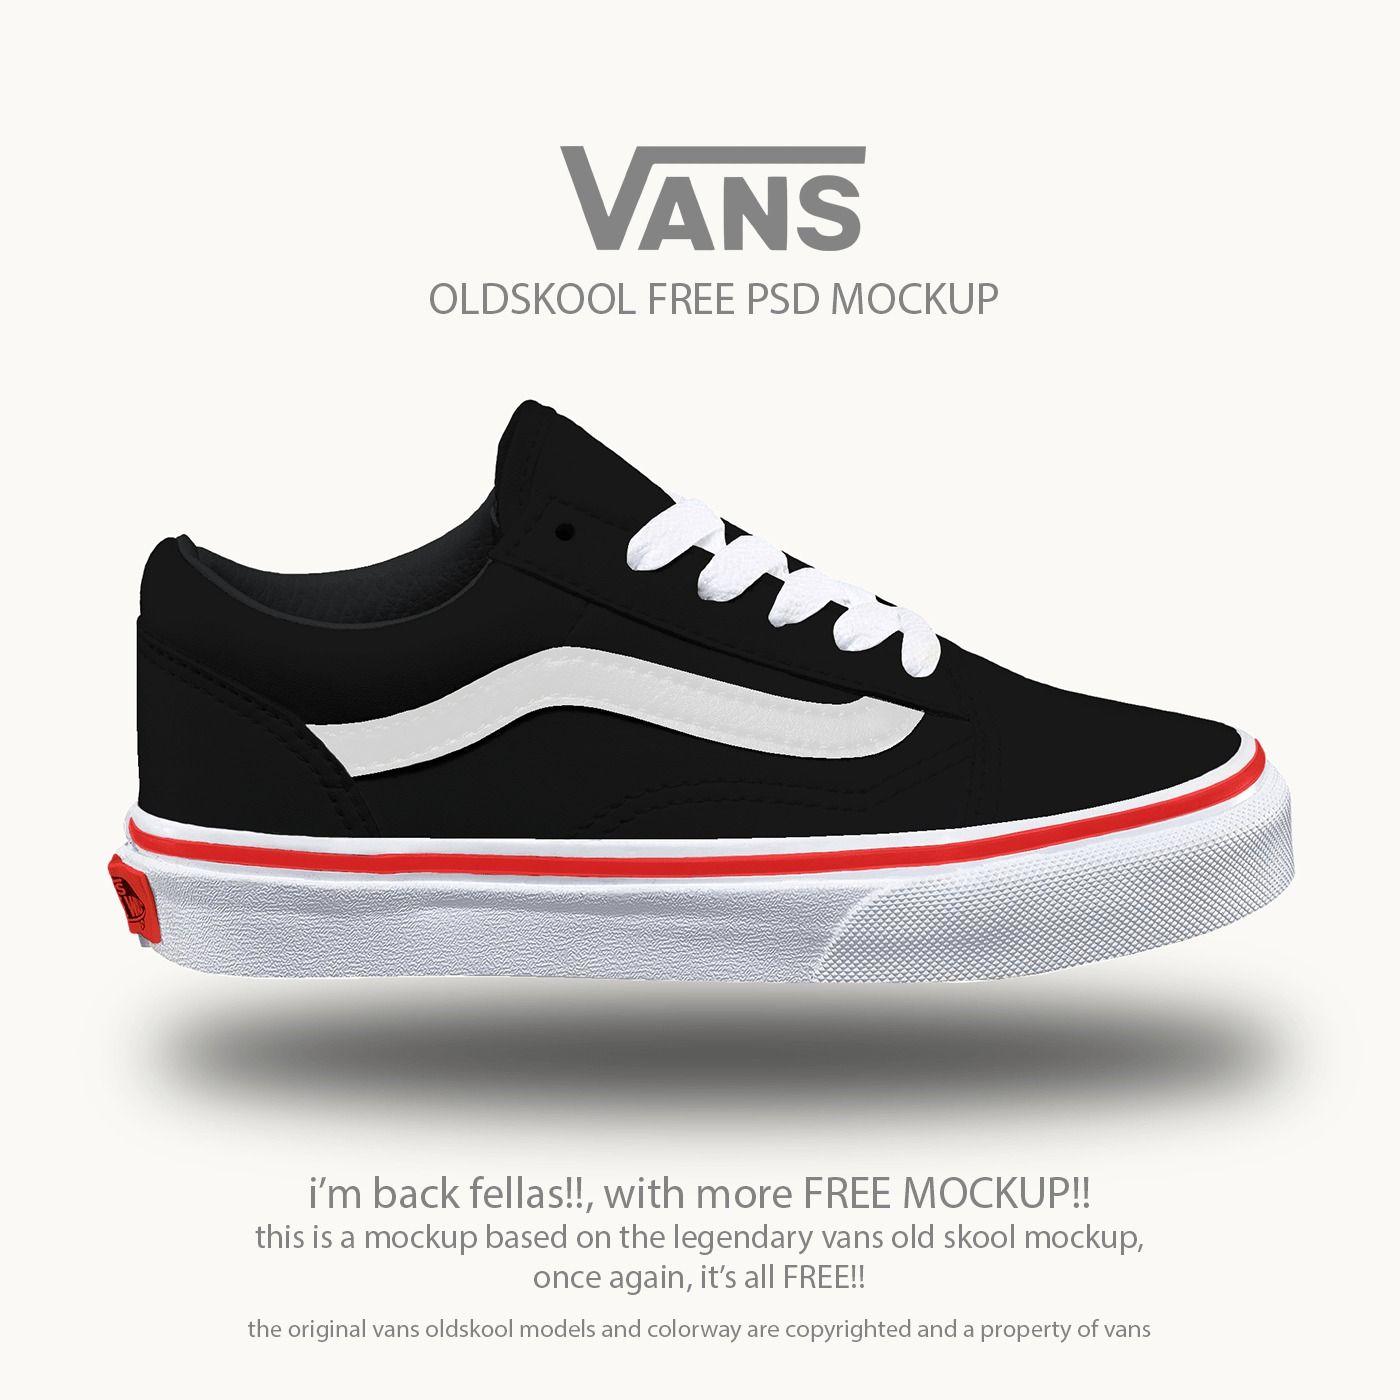 Vans Oldskool Free Psd Mockup Mockup Free Psd Mockup Psd School Shoes